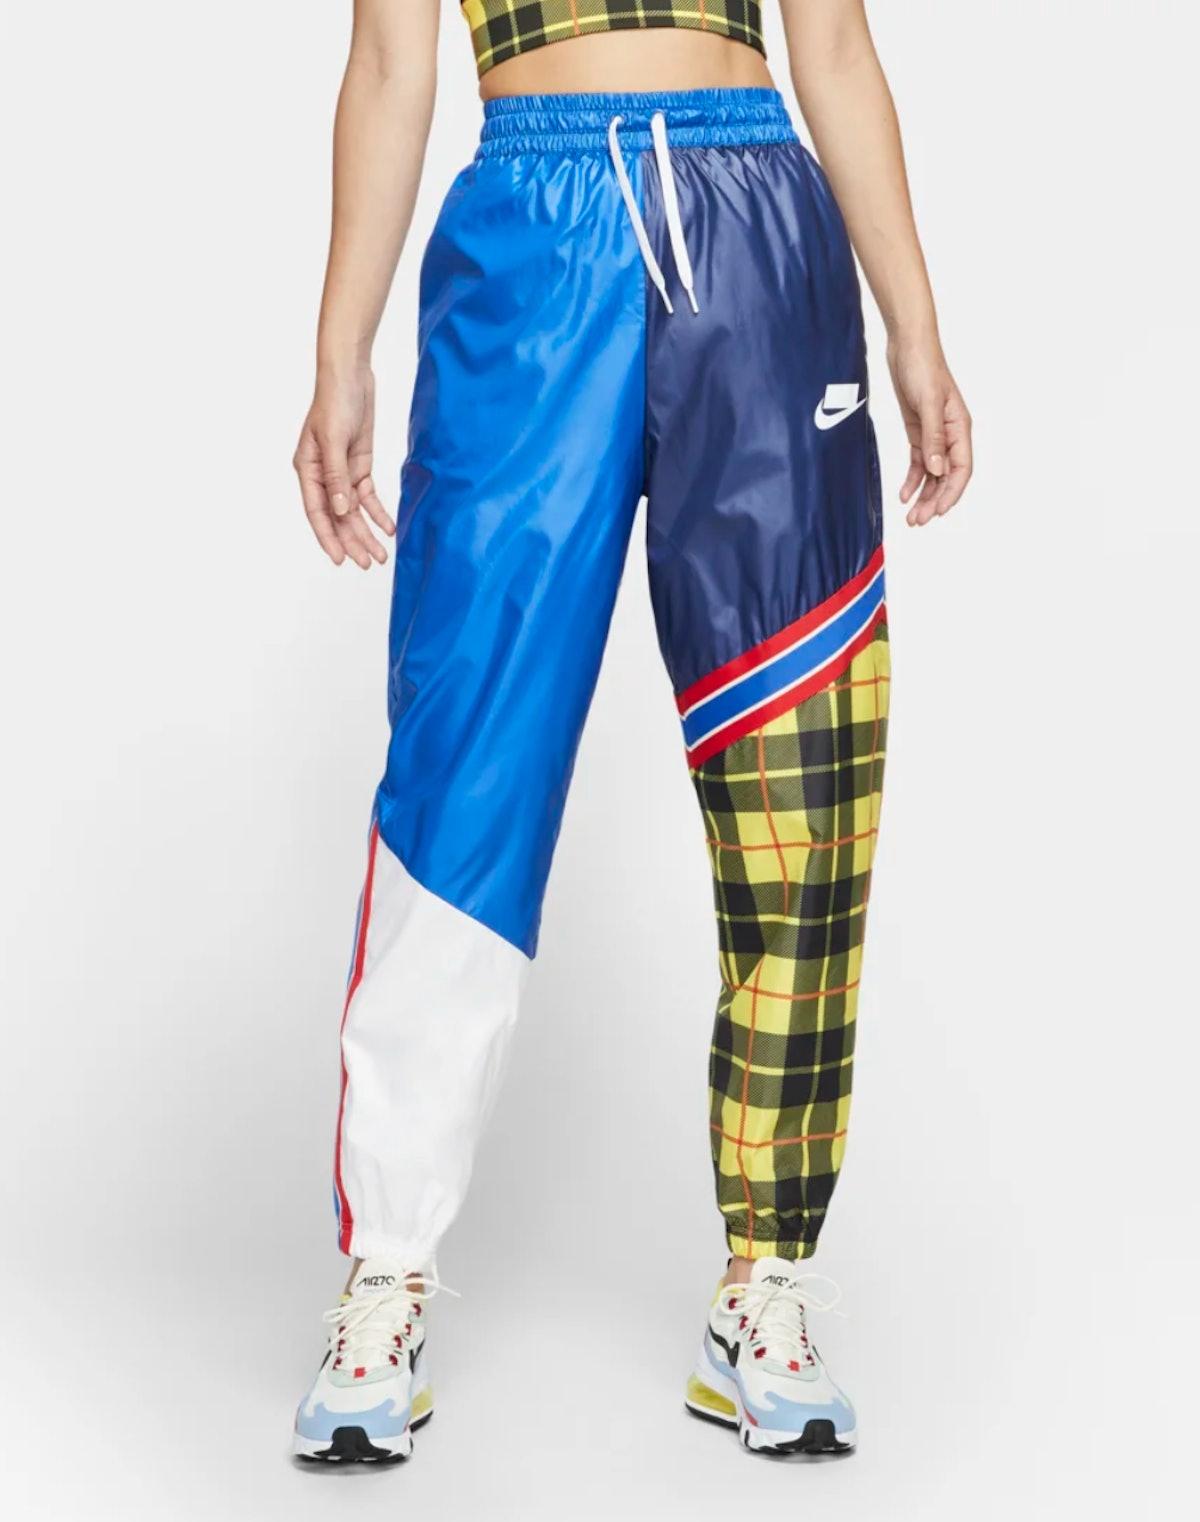 Women's Woven Plaid Pants